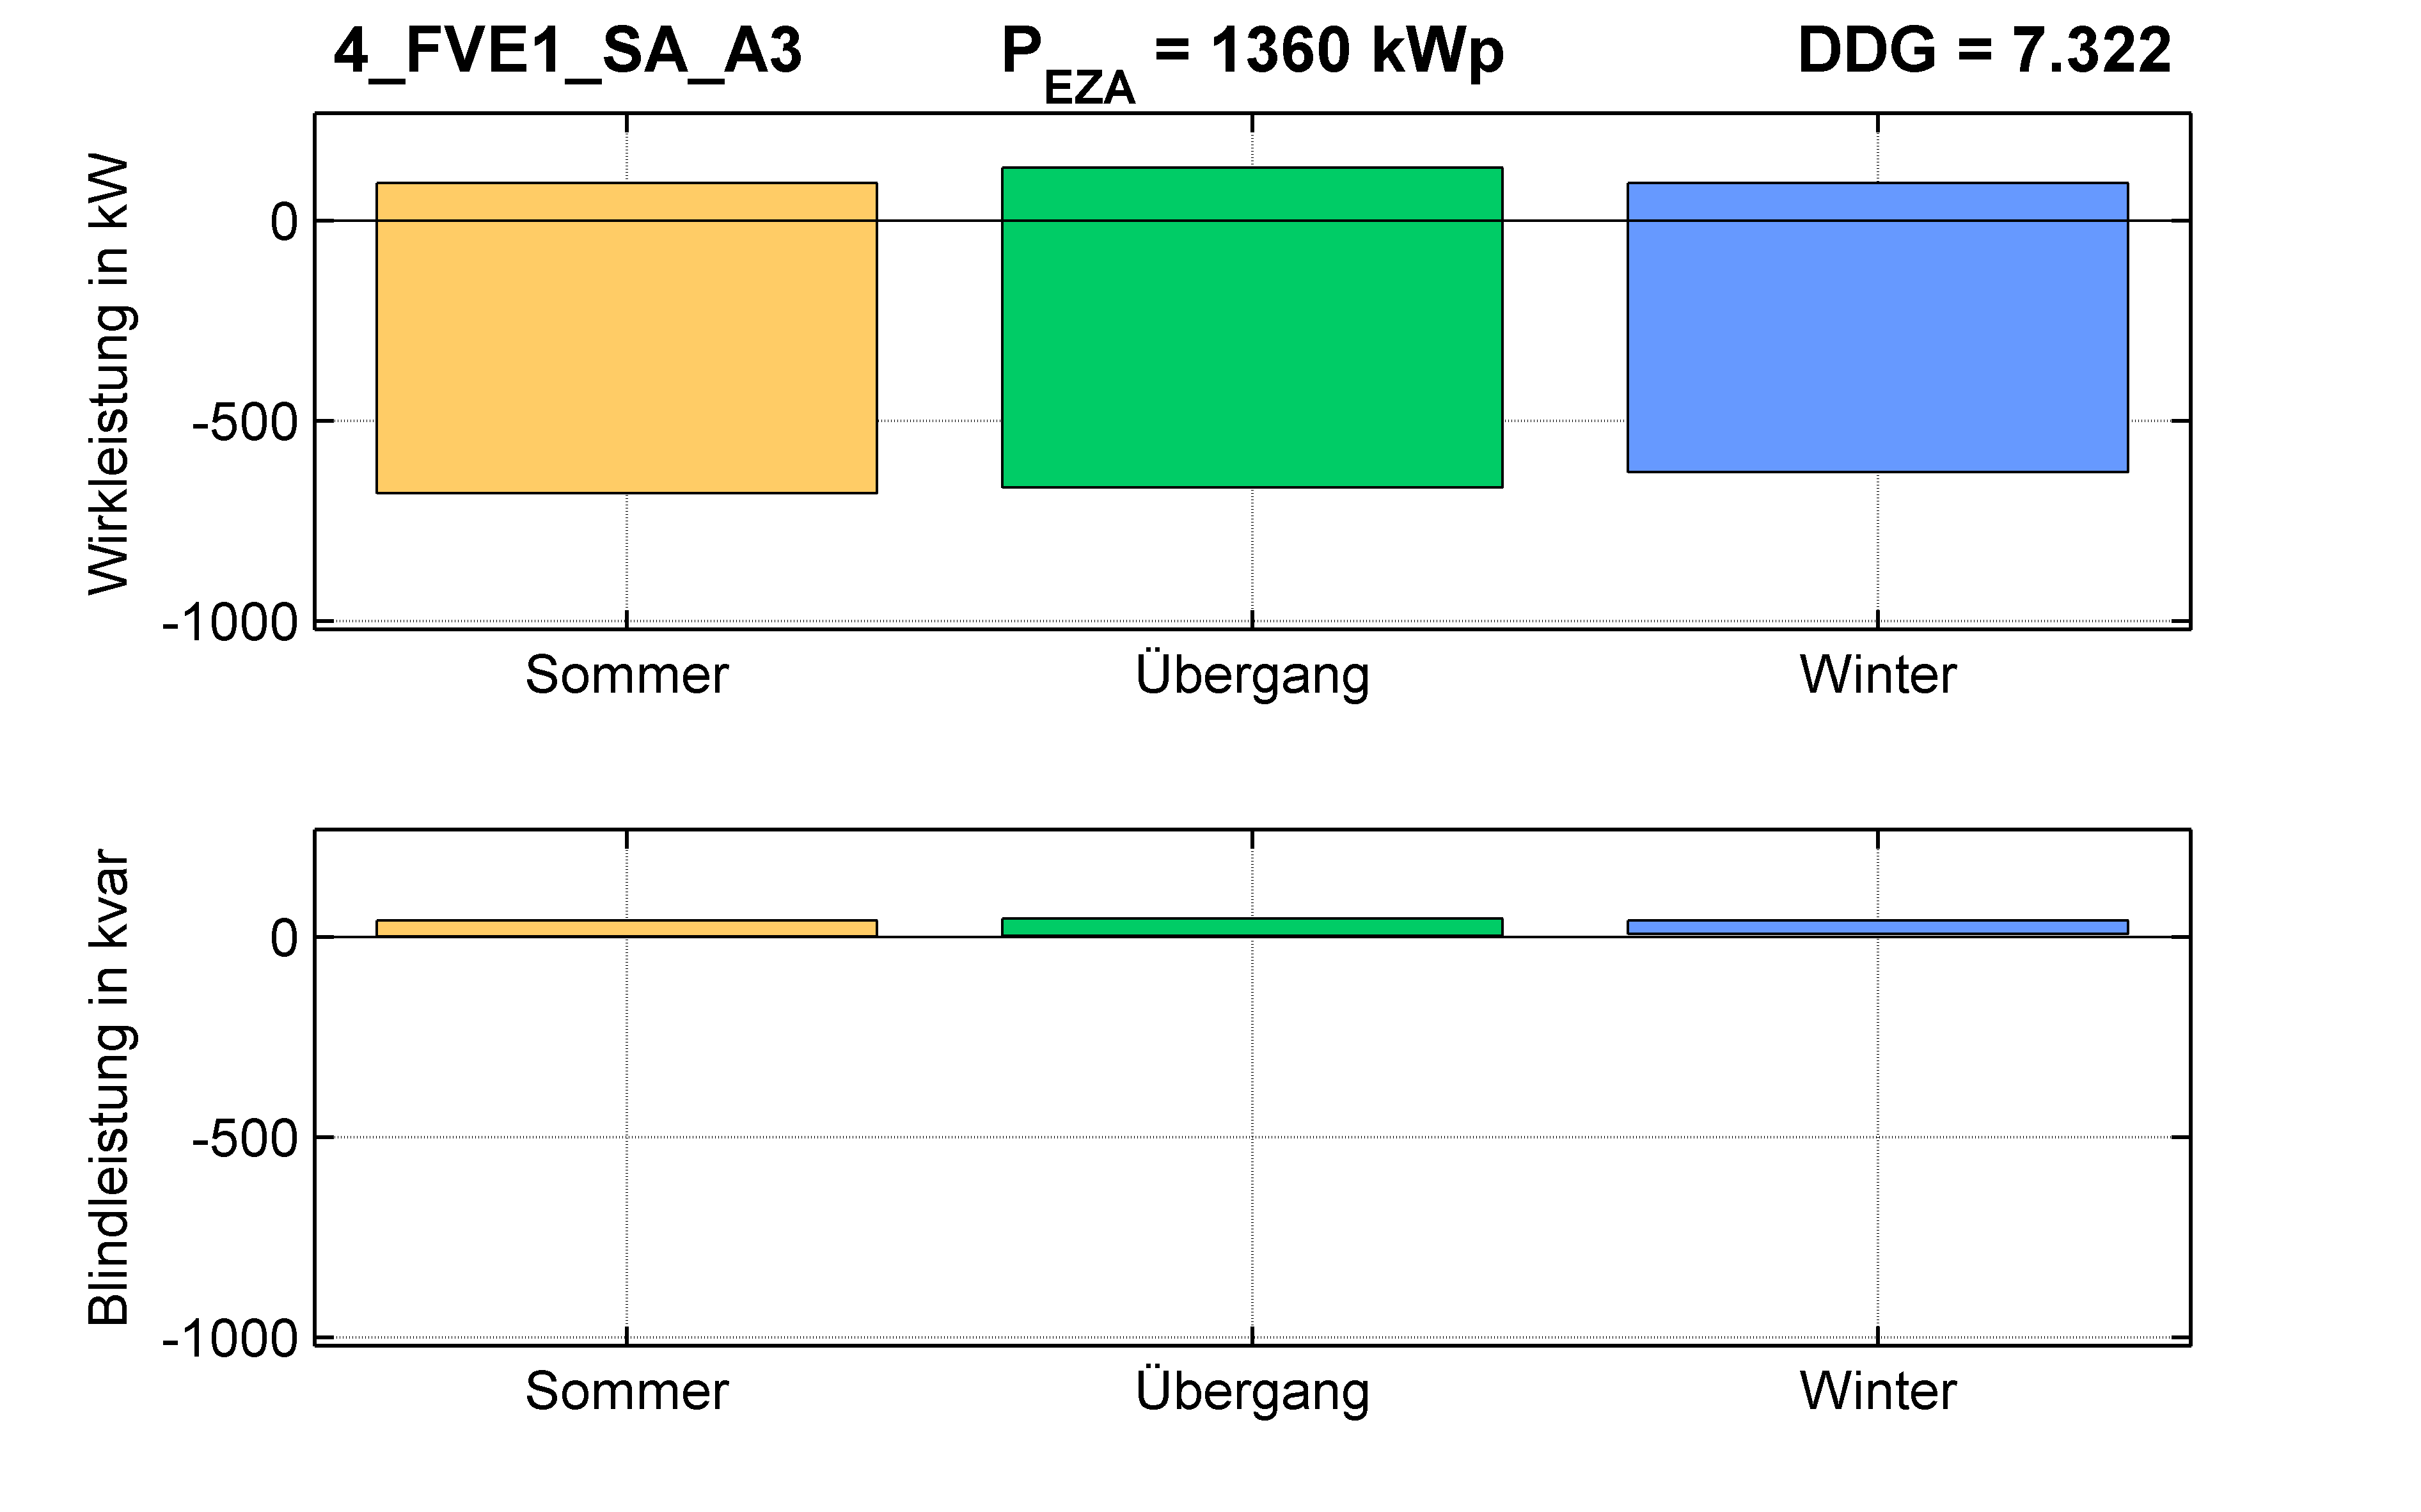 FVE1 | P-Kappung 55% (SA) A3 | PQ-Bilanz